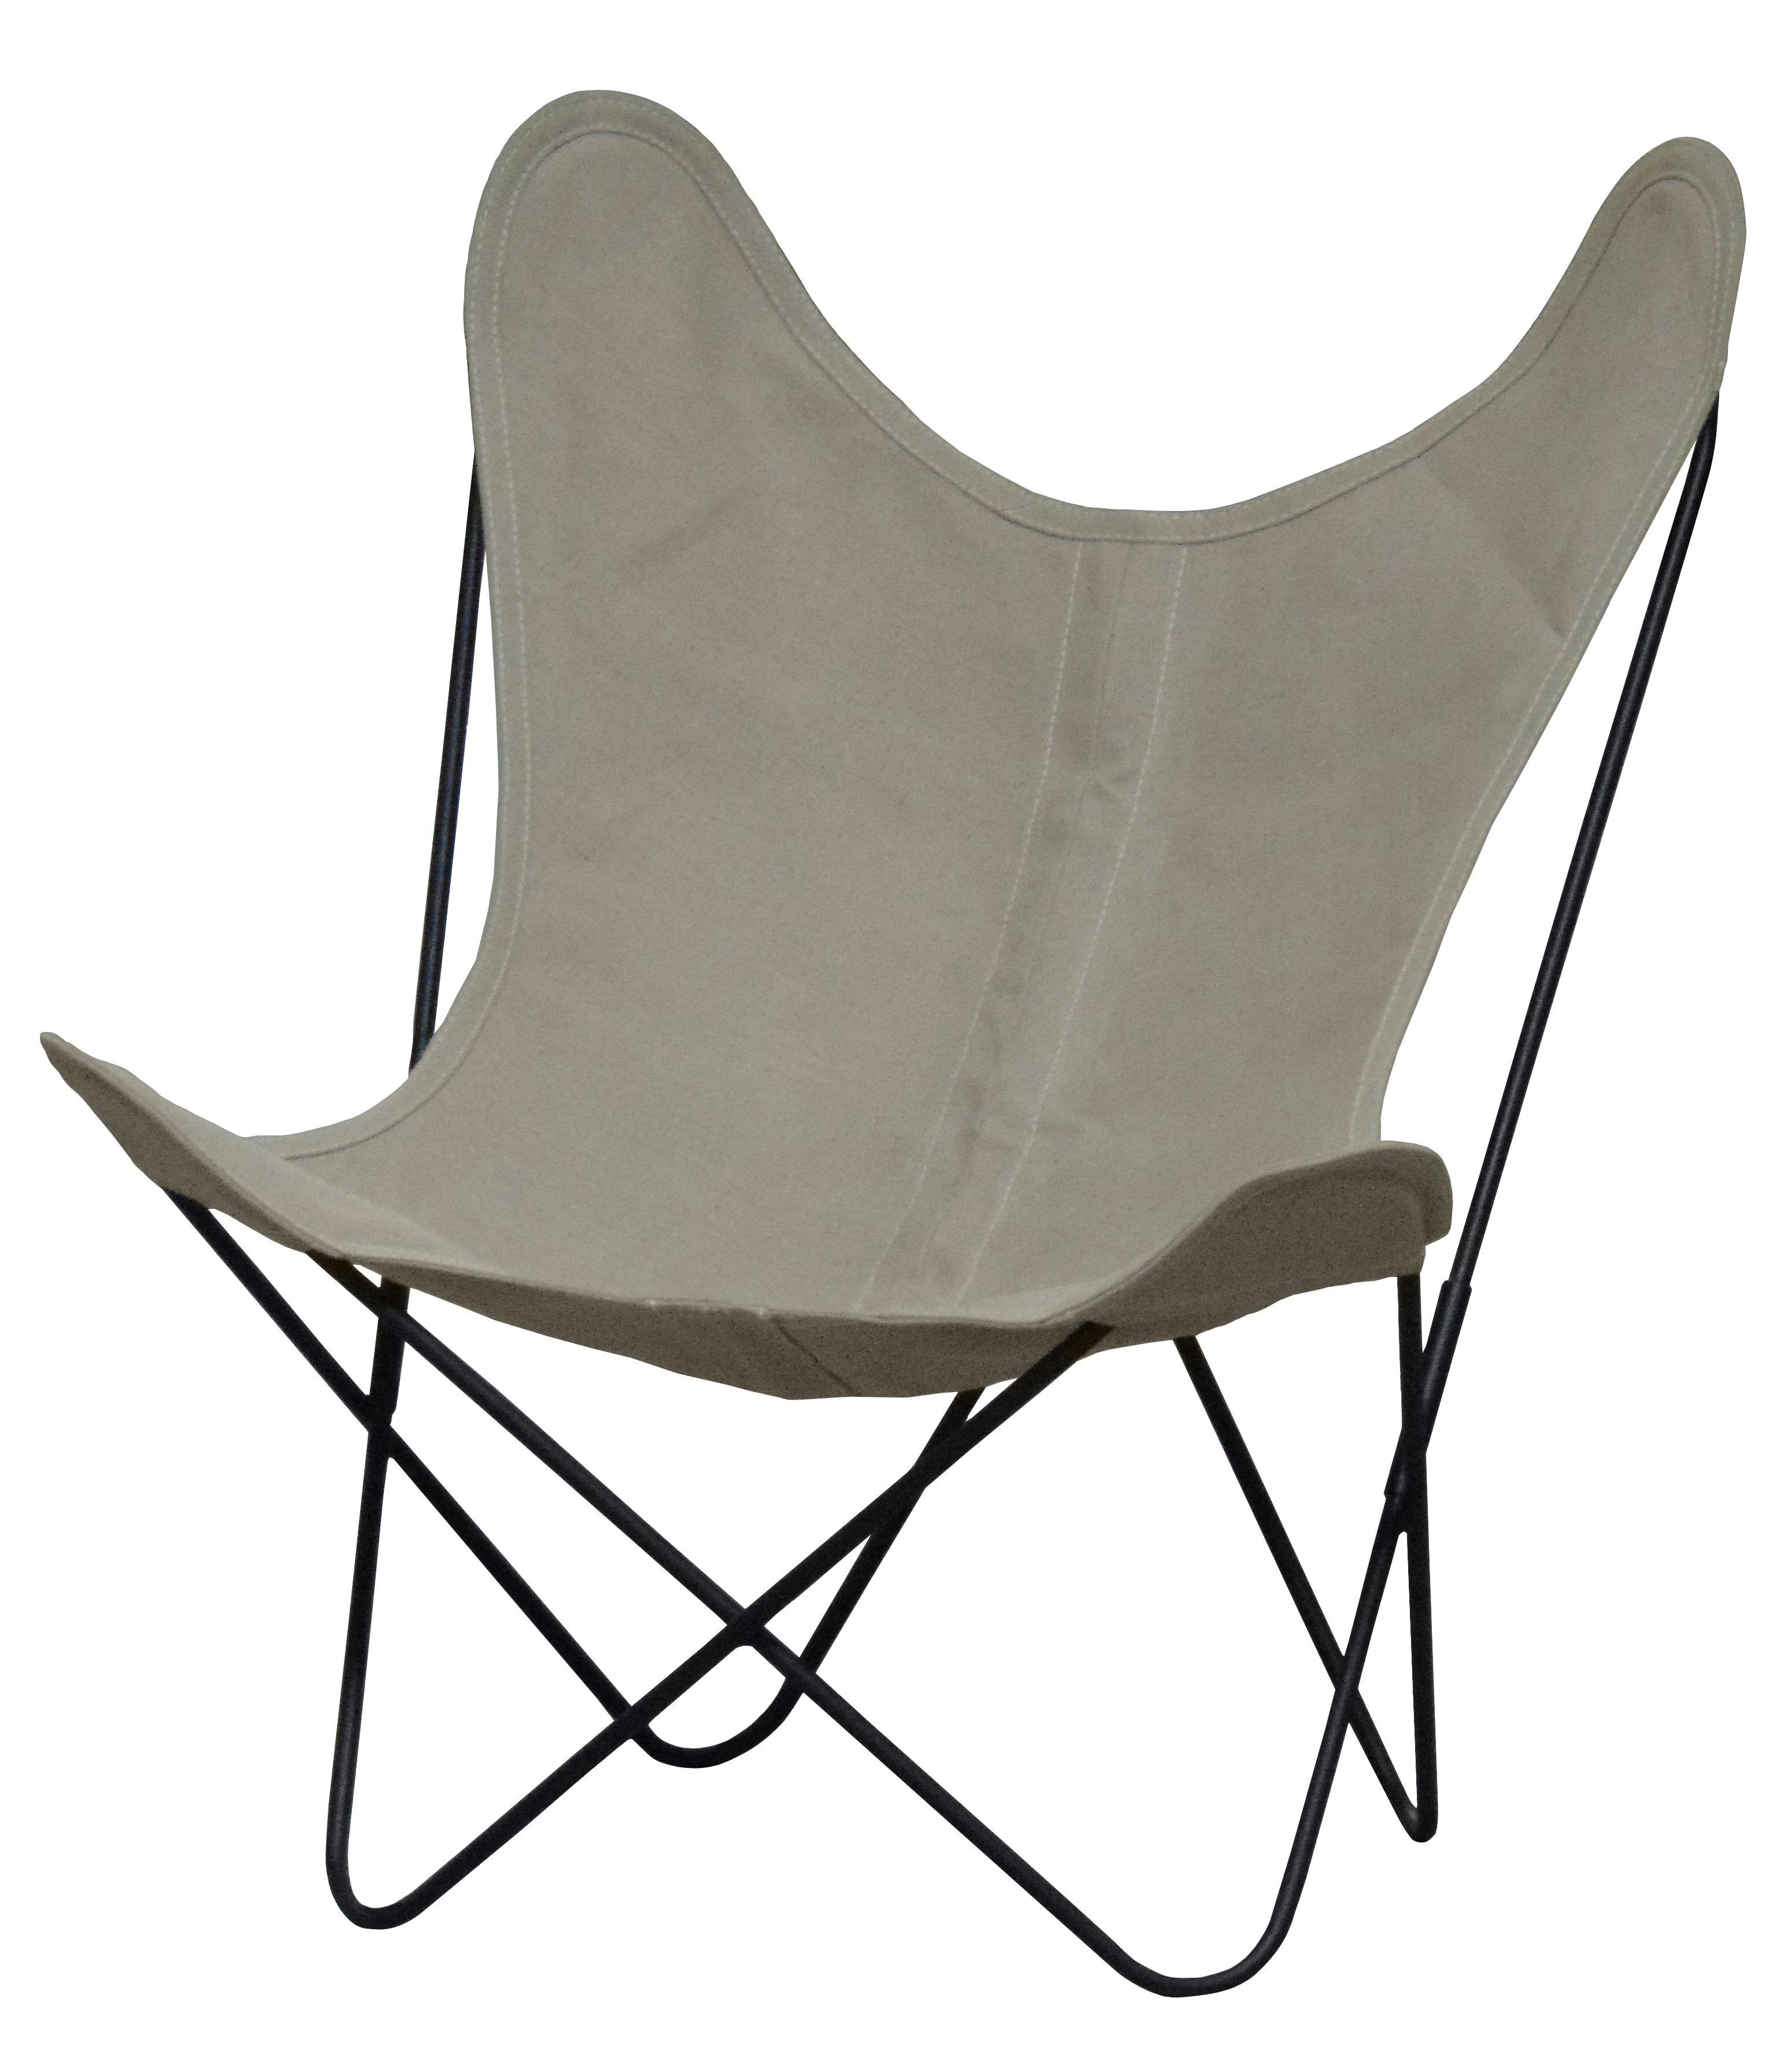 Furniture - Armchairs - AA Butterfly Low armchair - Linen / Black structure by AA-New Design - Black structure / Ecru linen - Linen, Steel